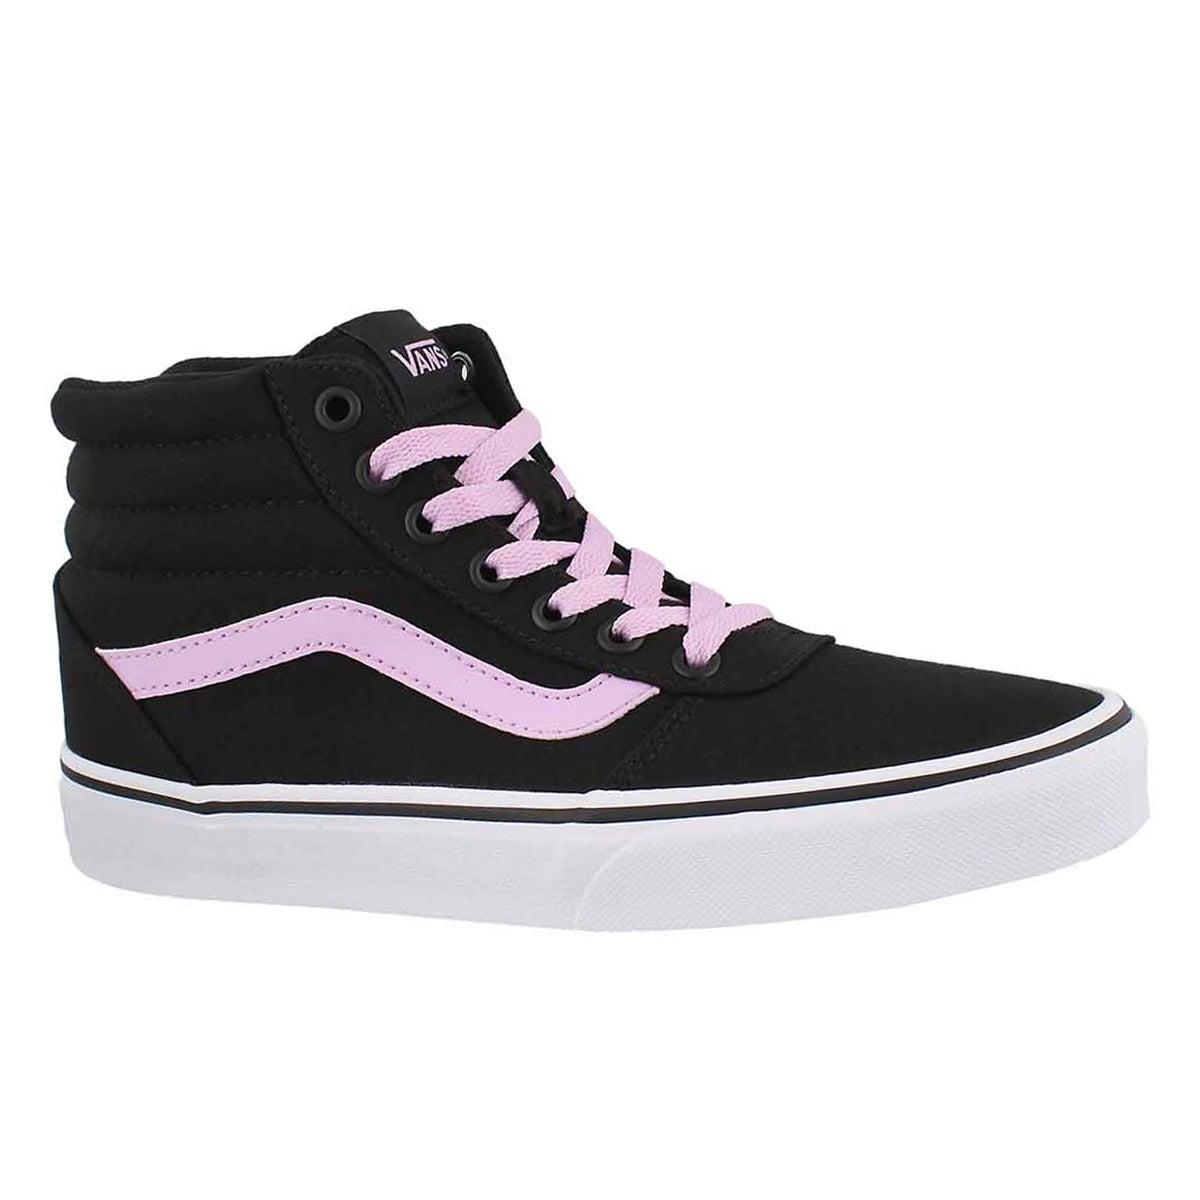 Women's WARD HI black/lilac laceup sneakers